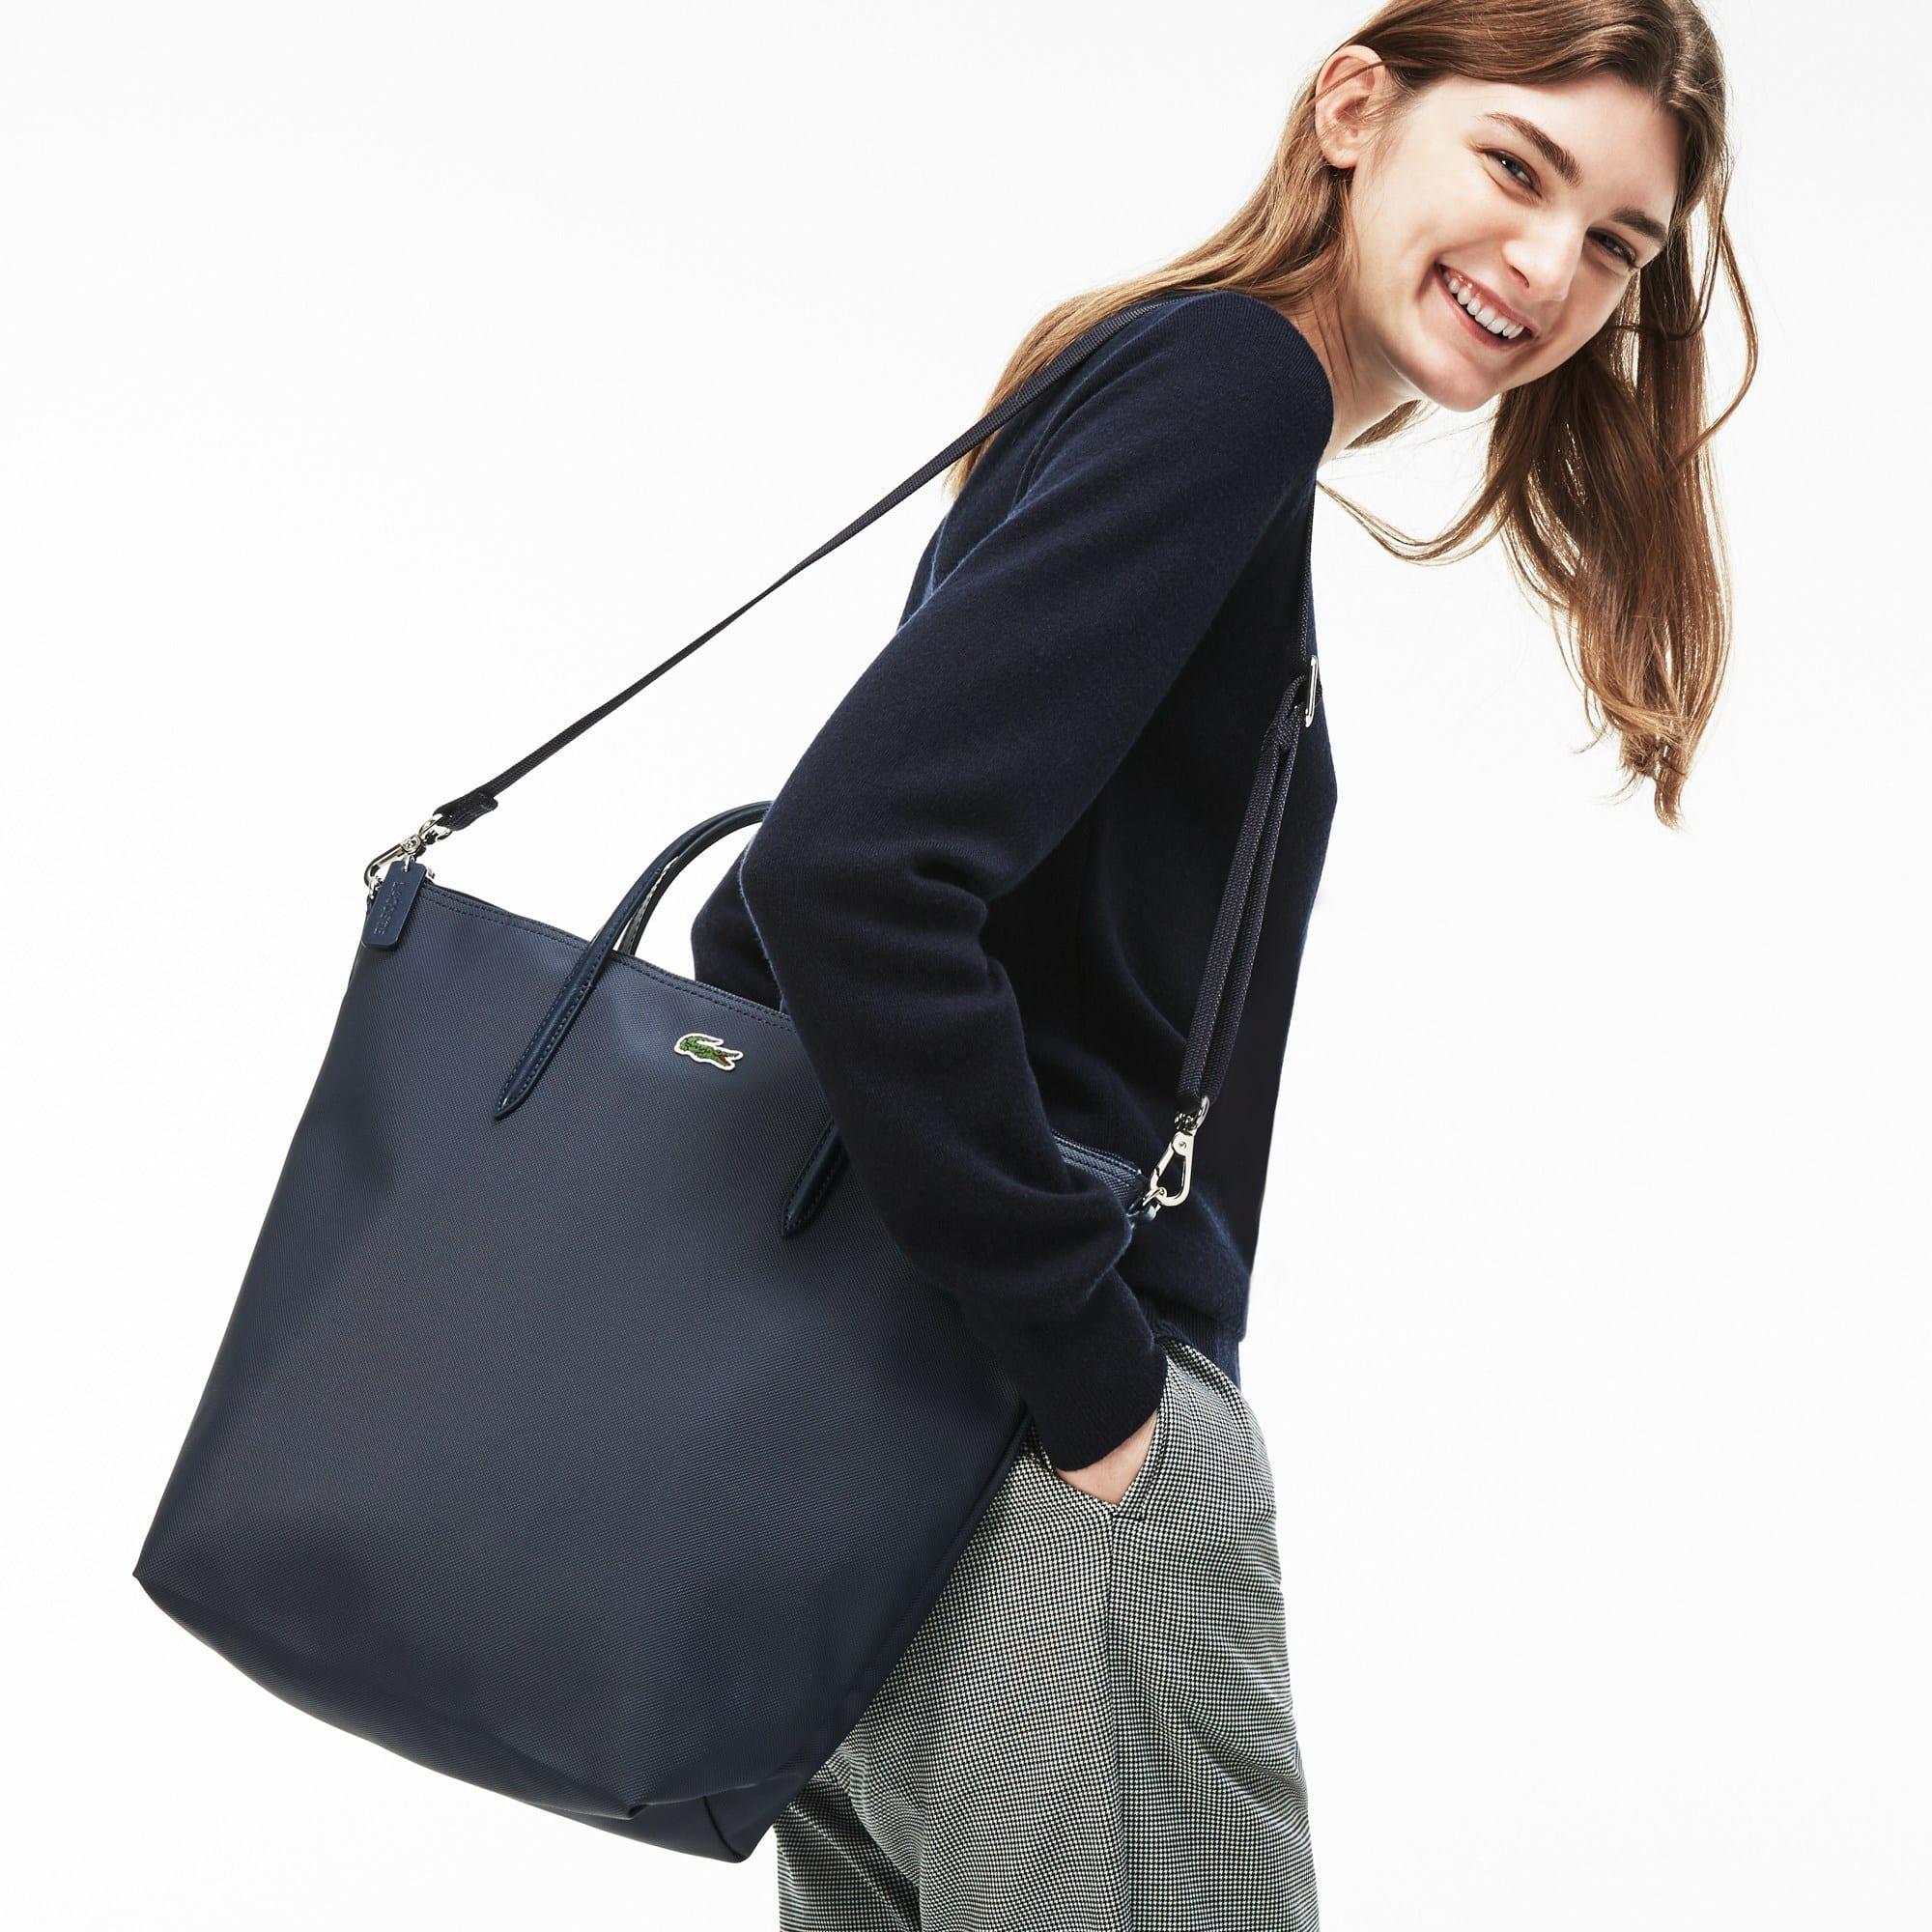 Shopping bag verticale a doppia modalità d'uso L.12.12 Concept tinta unita